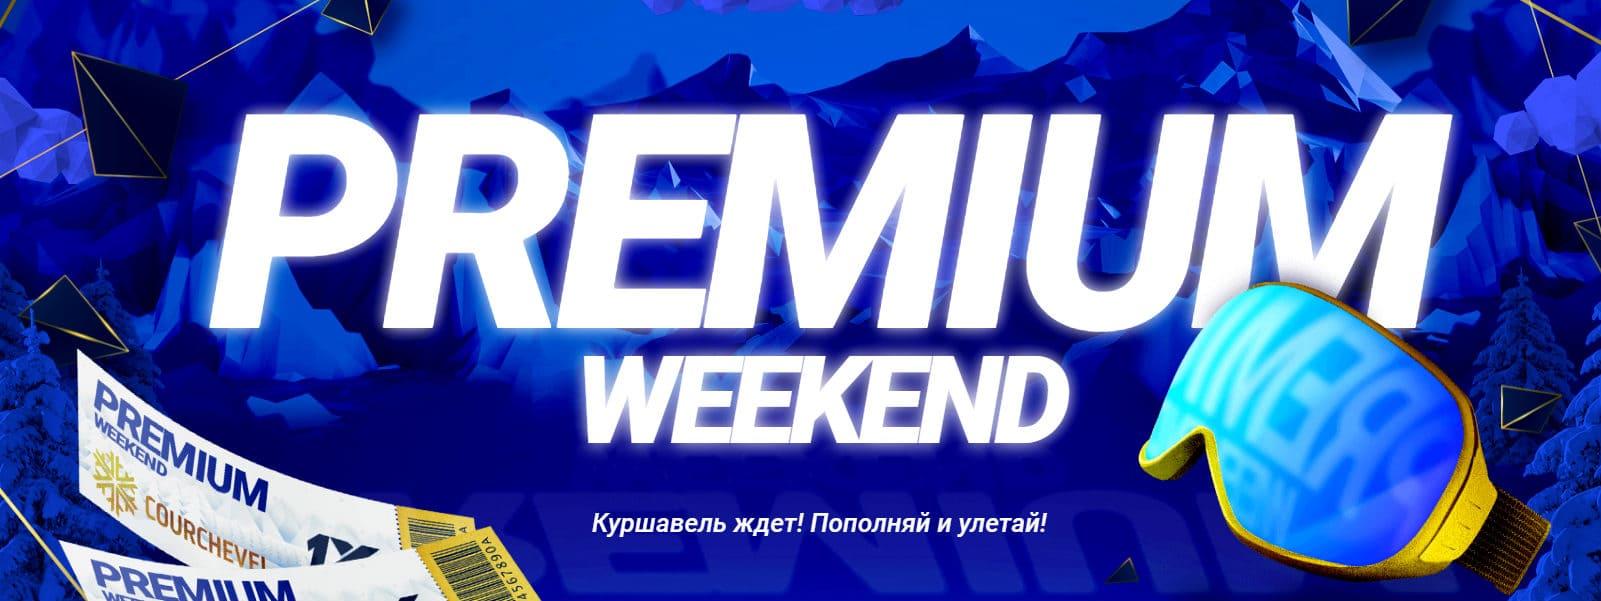 Premium Weekend от 1xBet